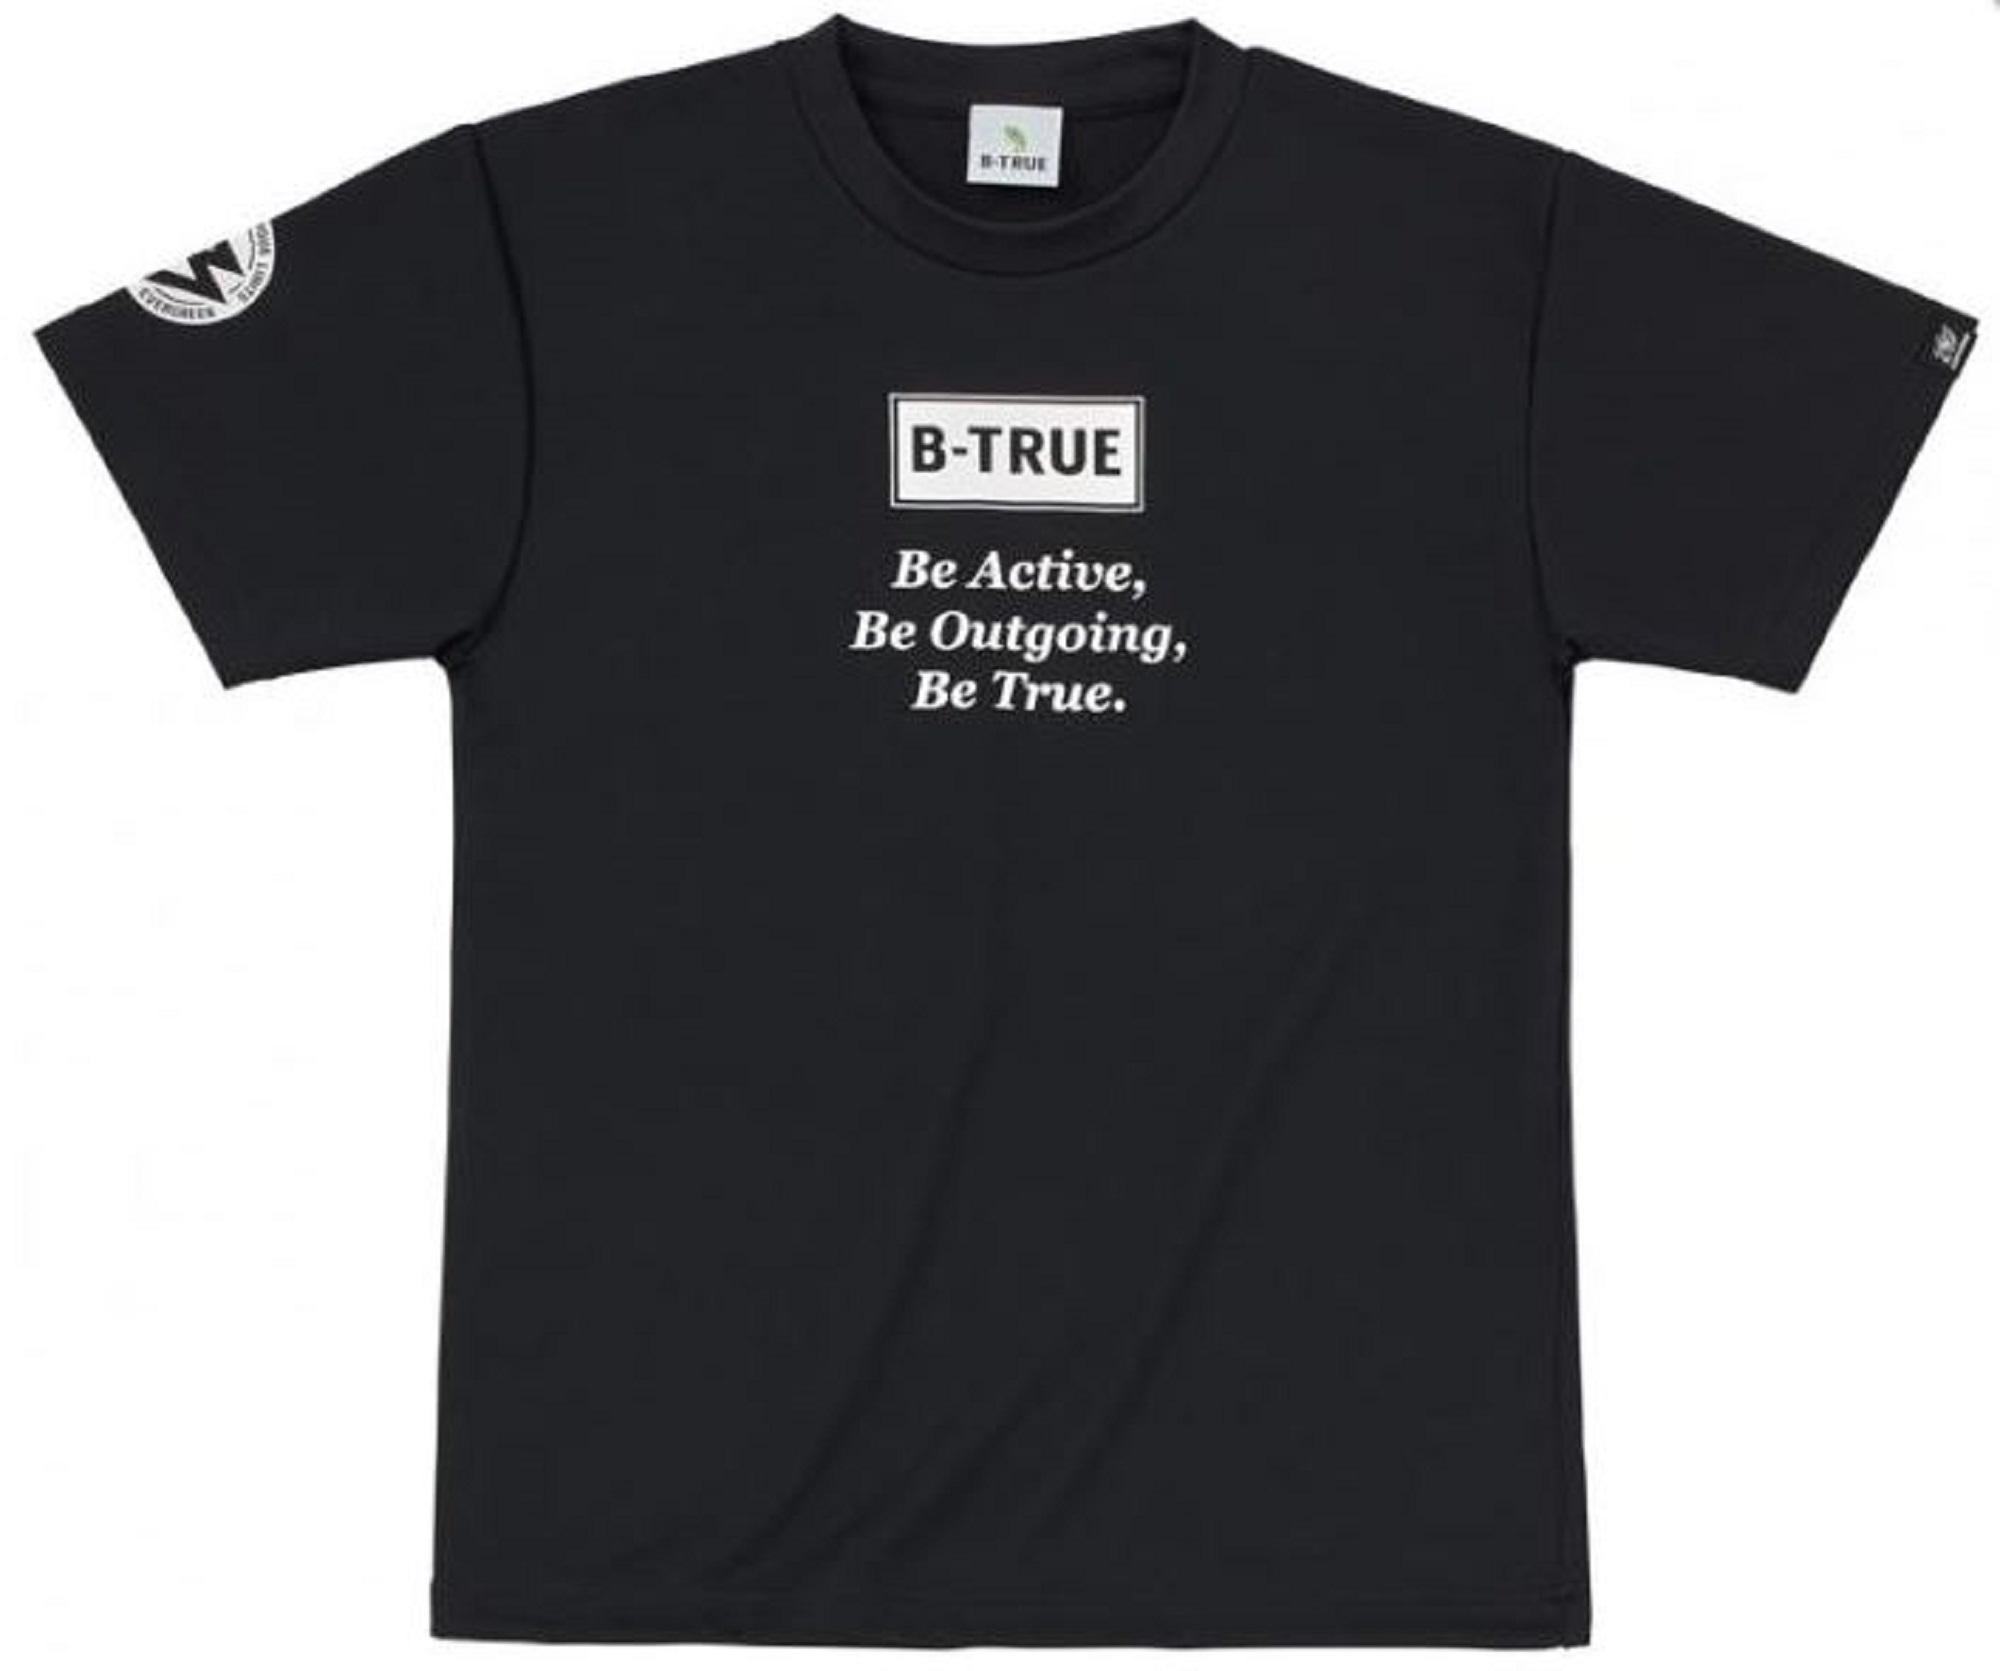 Evergreen T-Shirt Dry Fit Short Sleeve B-True D Type Size S Black (4784)